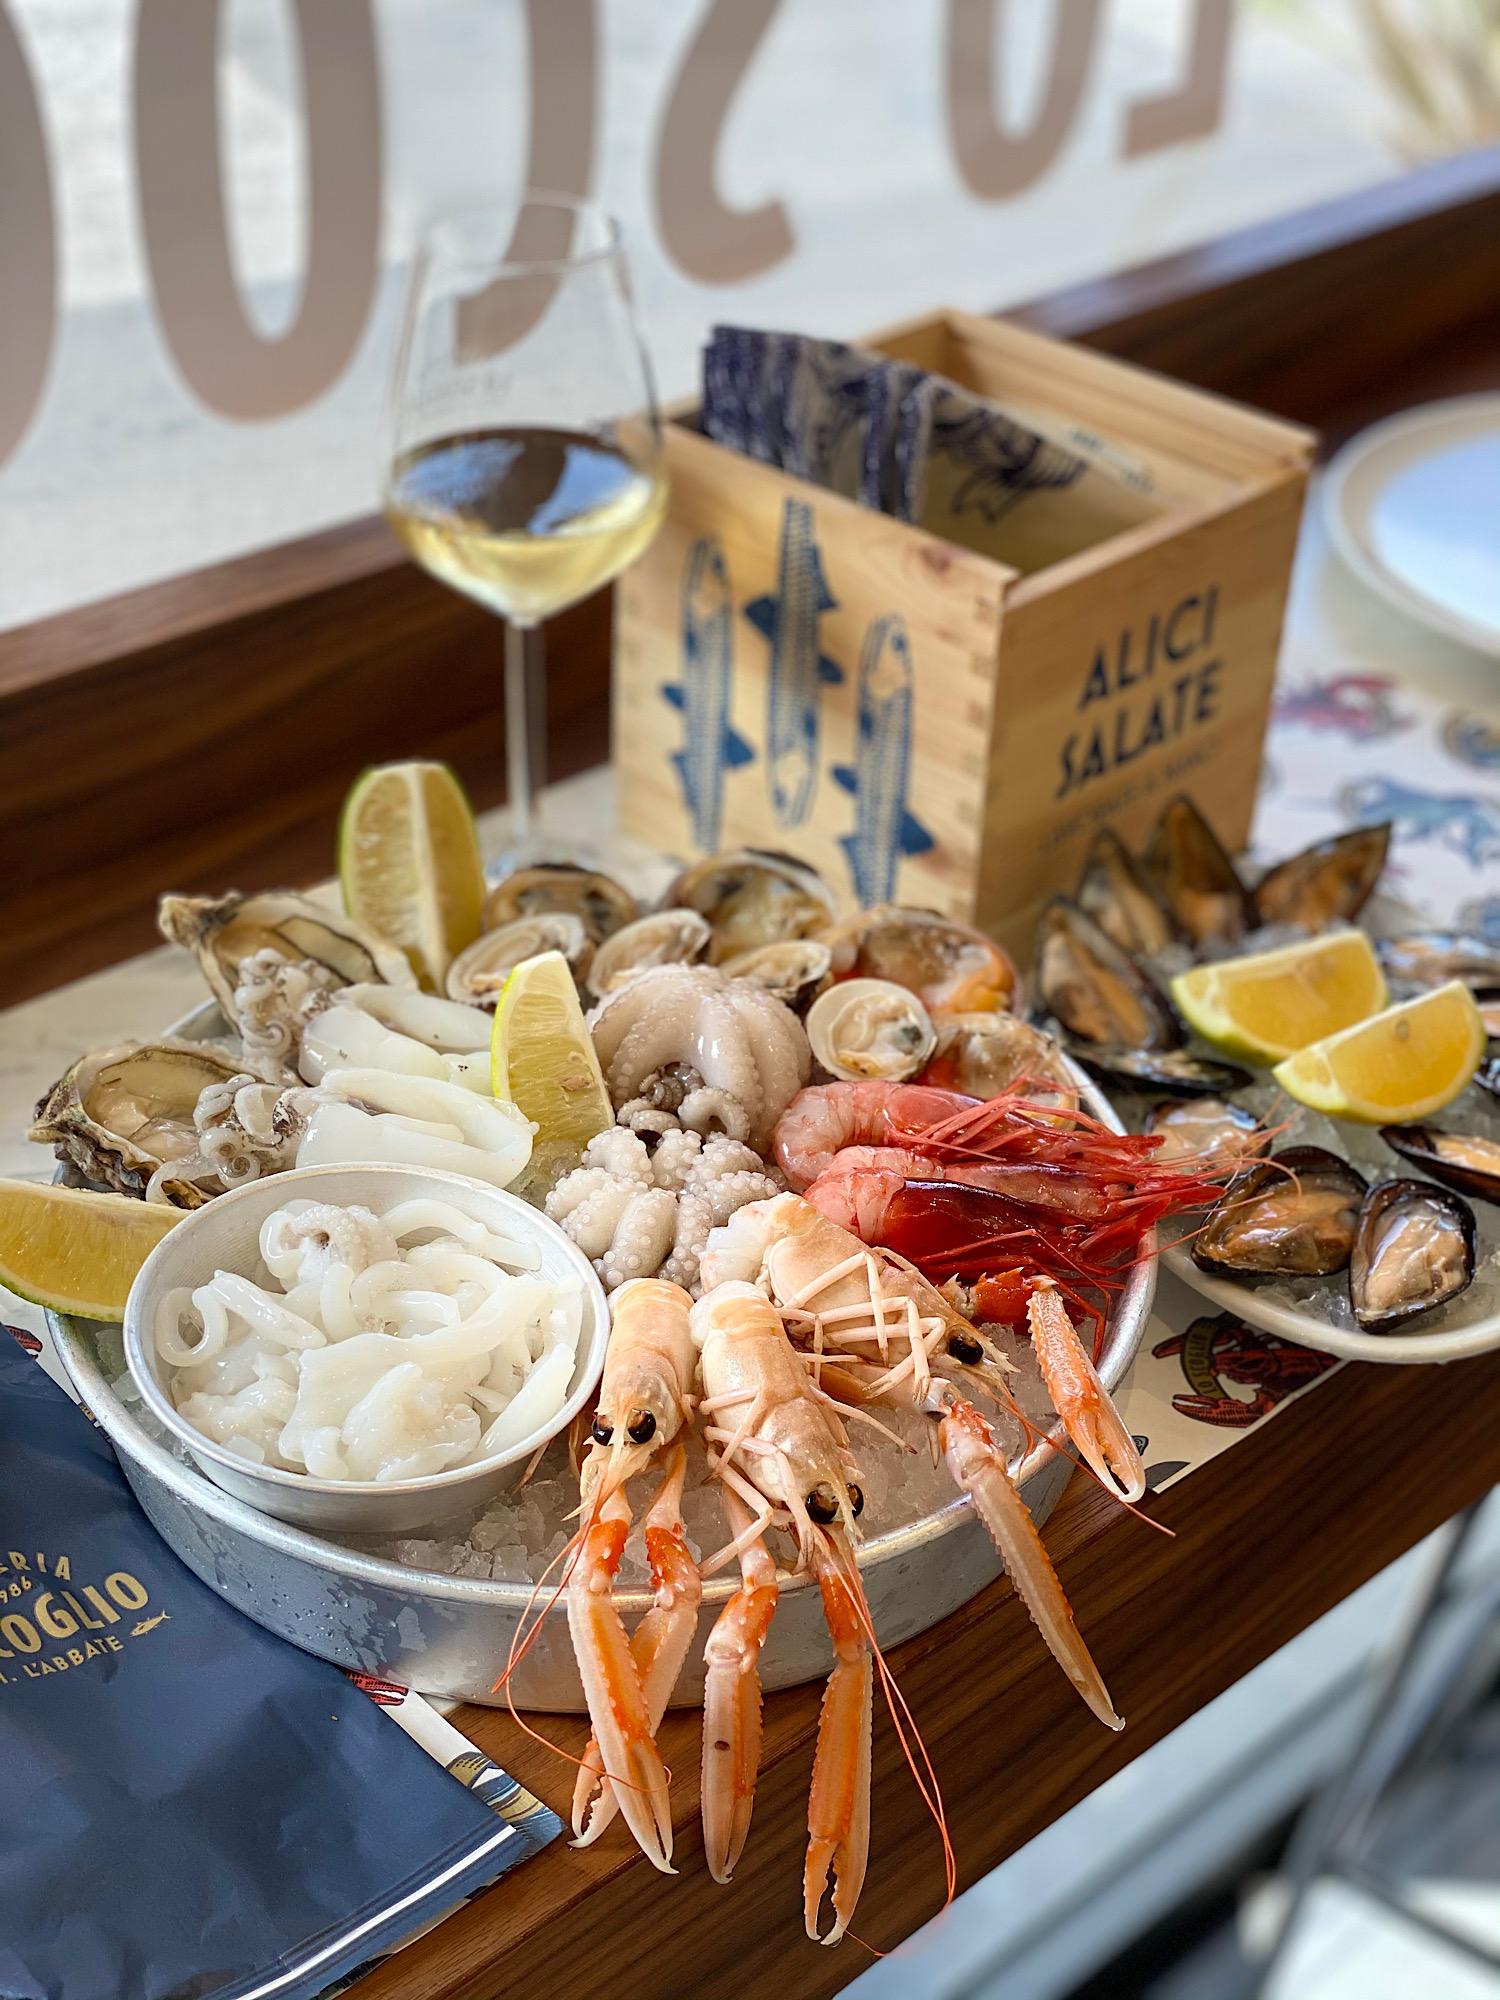 img_6522_seafood_tenger_gyumolcsei_puglia_nyers_jokuti_vilagevo.jpg